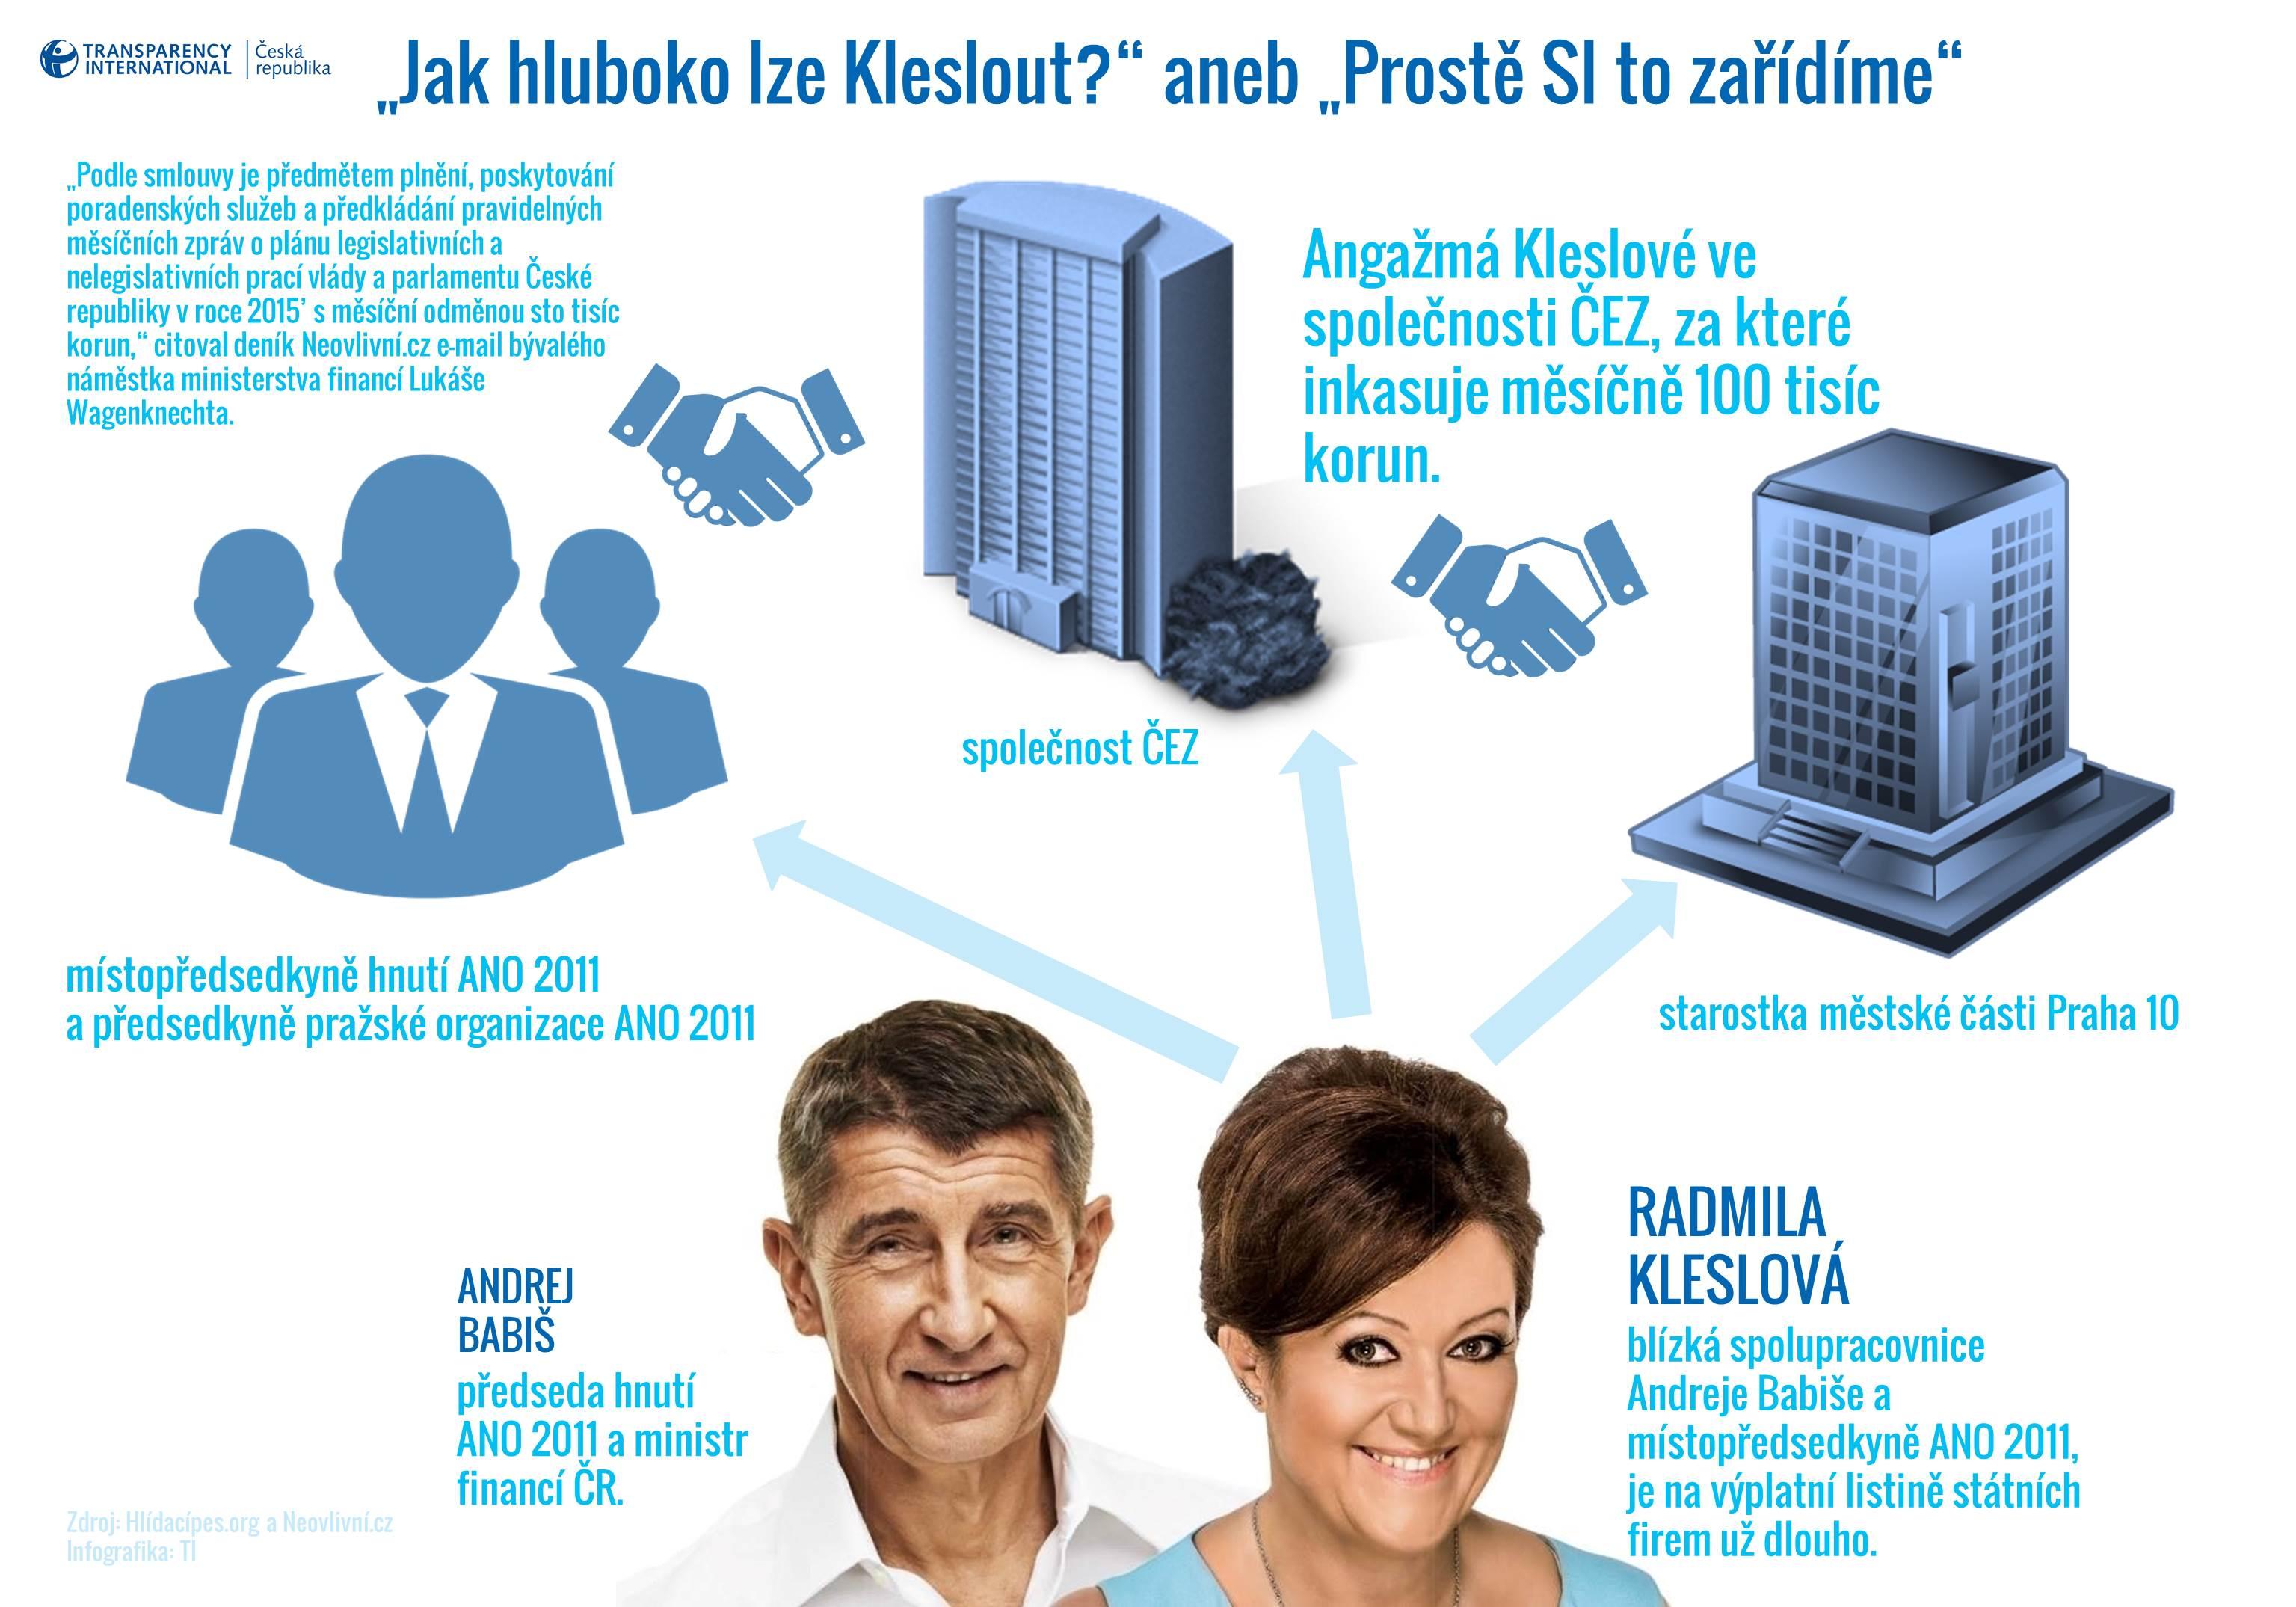 RK ČEZ - Infotainment